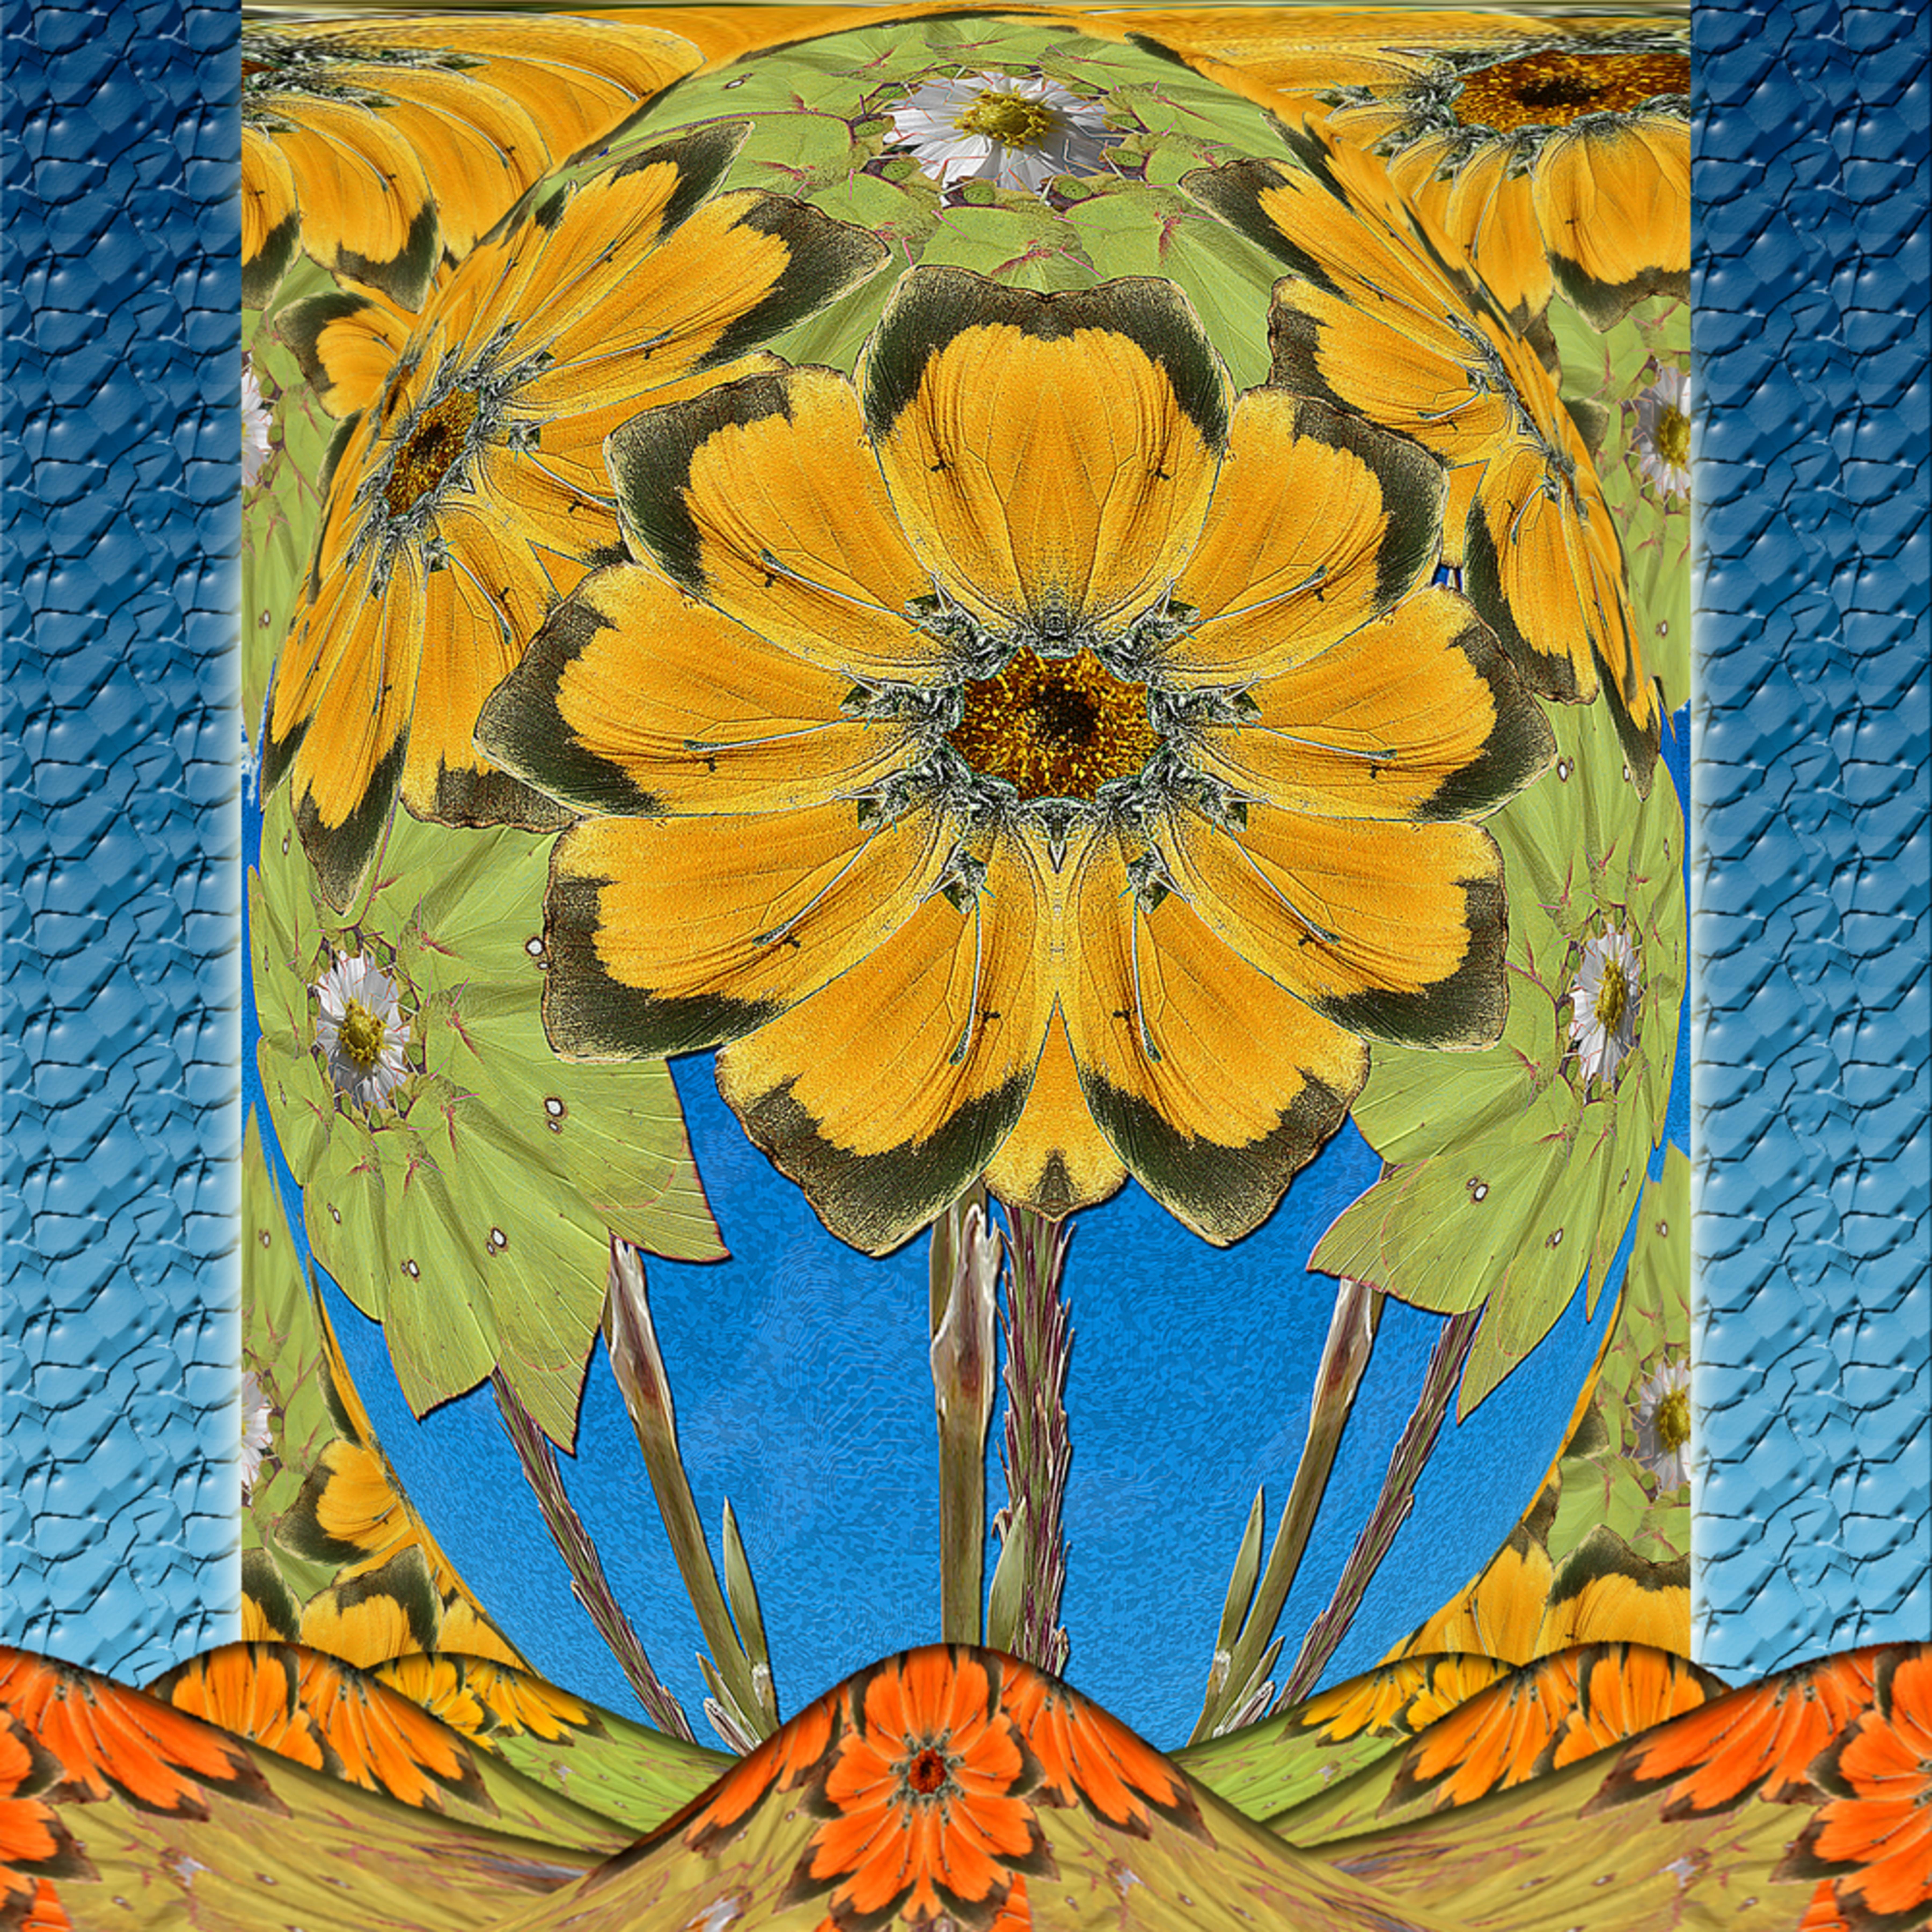 Butterflysunflowers rcia89